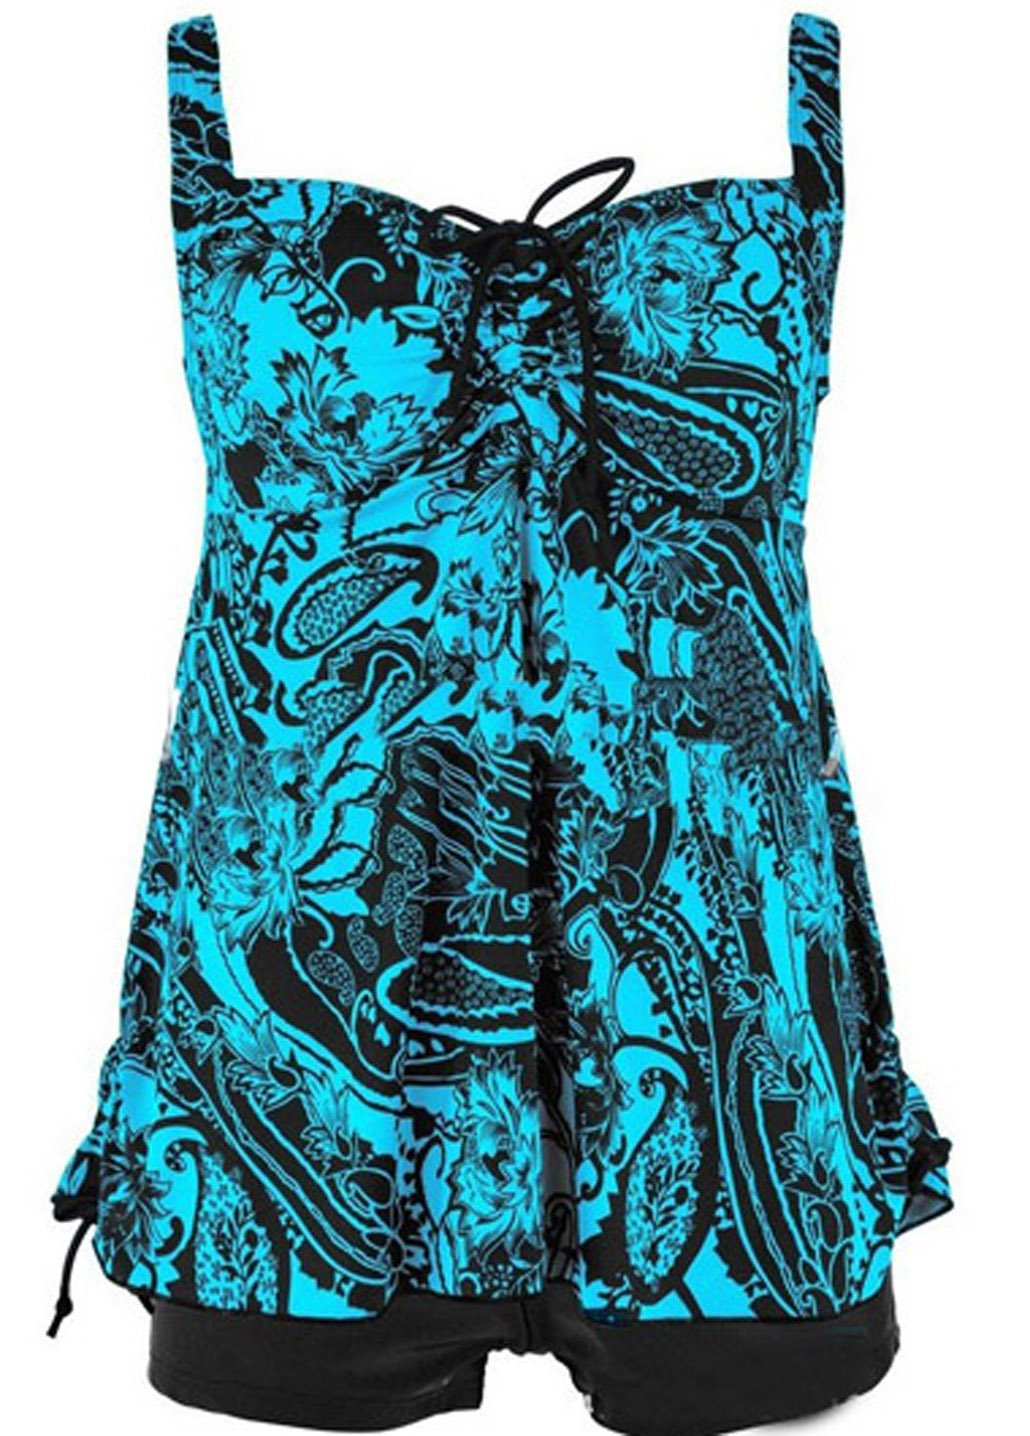 Tomlyws Women's Tankini Set Floral Printed Swimsuit Two Piece Summer Swimwear Lake Blue XXL